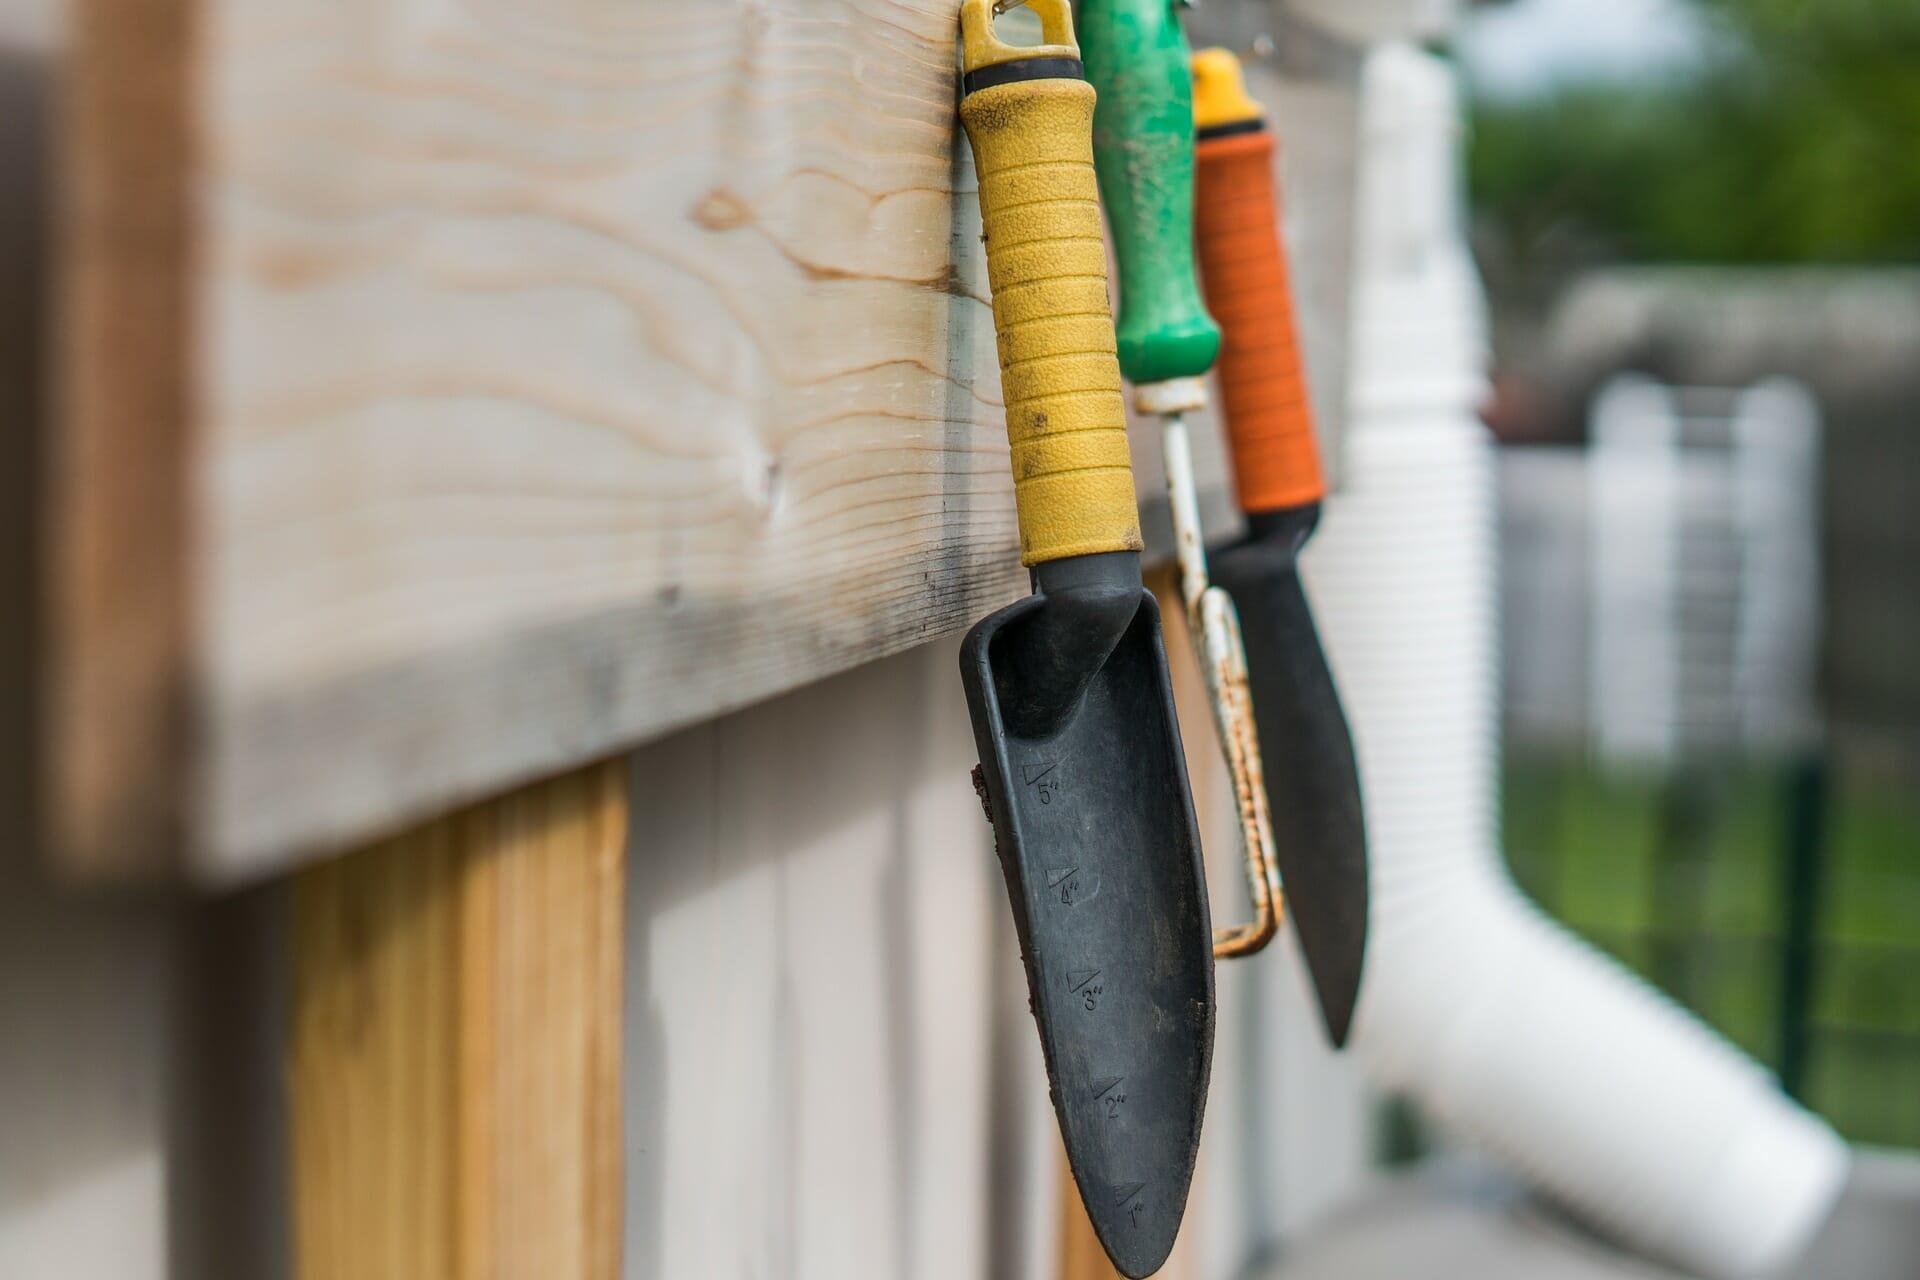 Gardening tools hung on rack